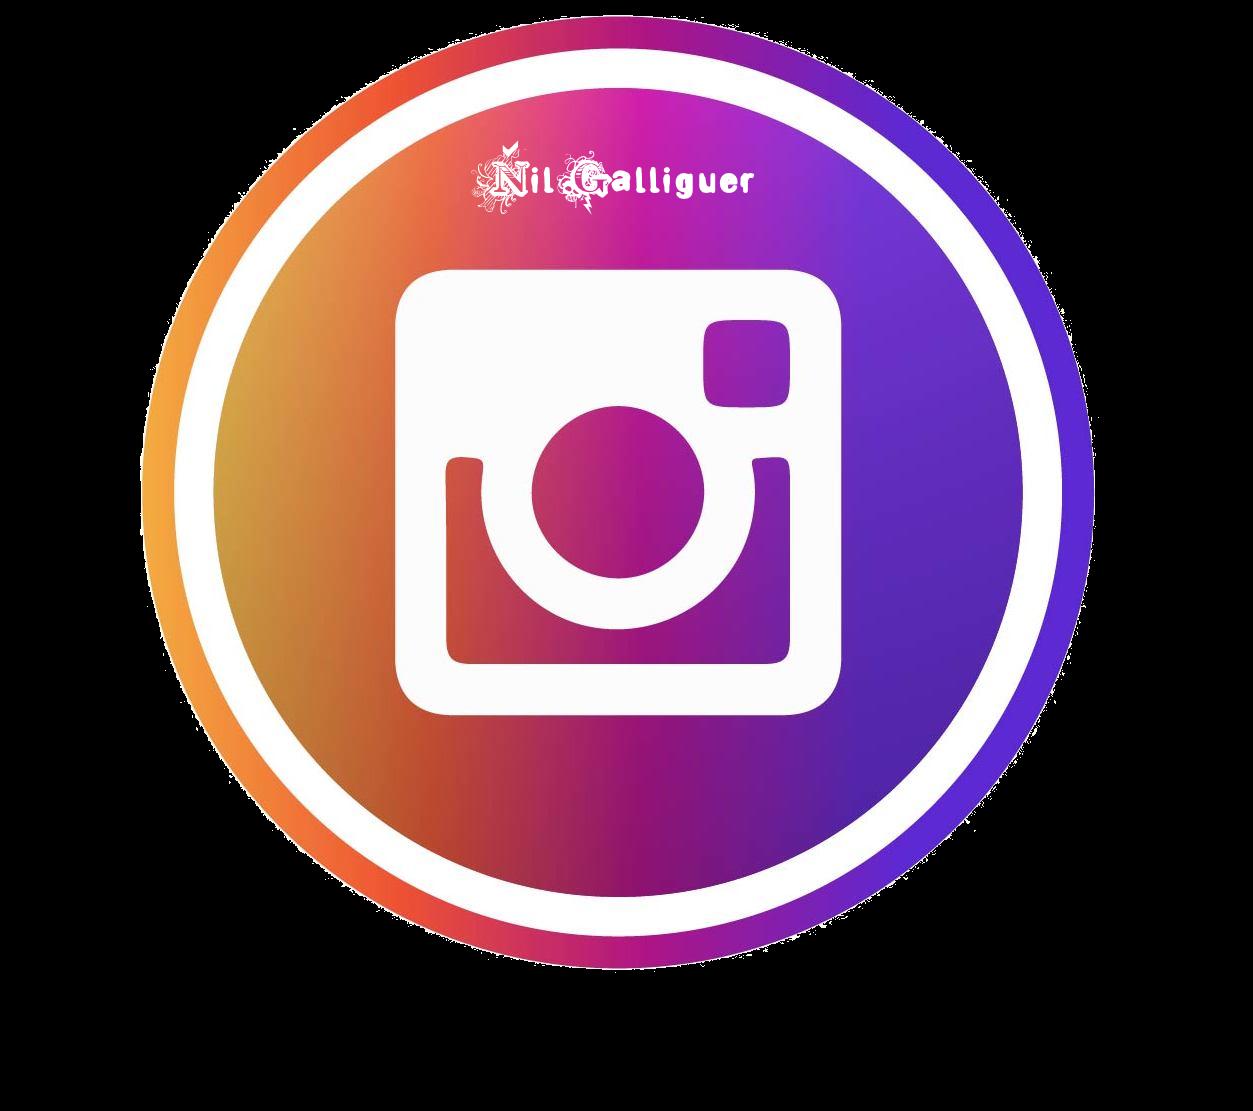 Instagram Nil Galliguer